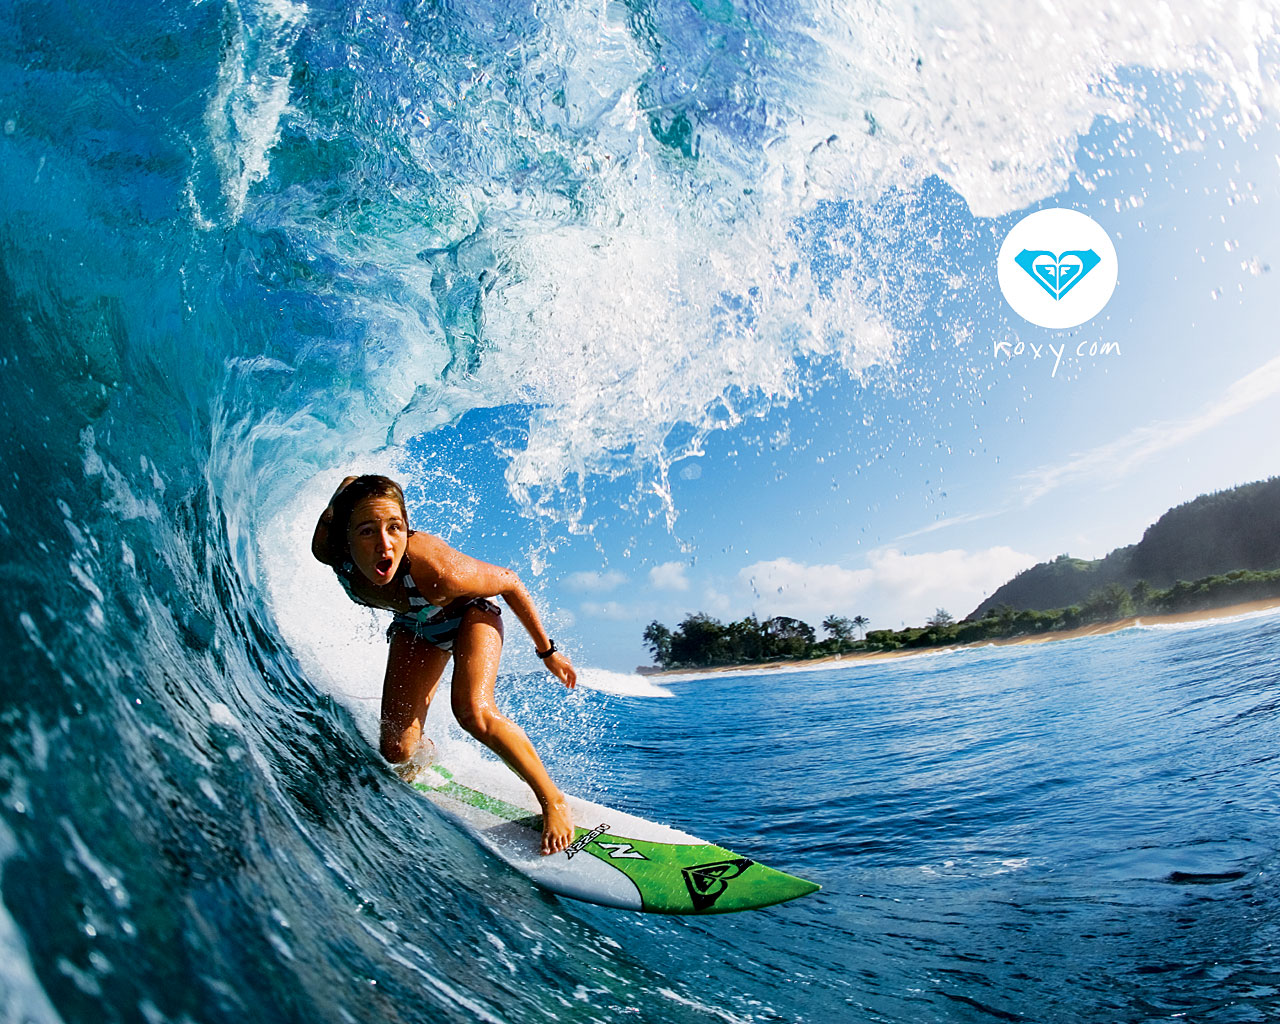 Fond dcran Roxy gratuit fonds cran Roxy surf vtement femme 1280x1024